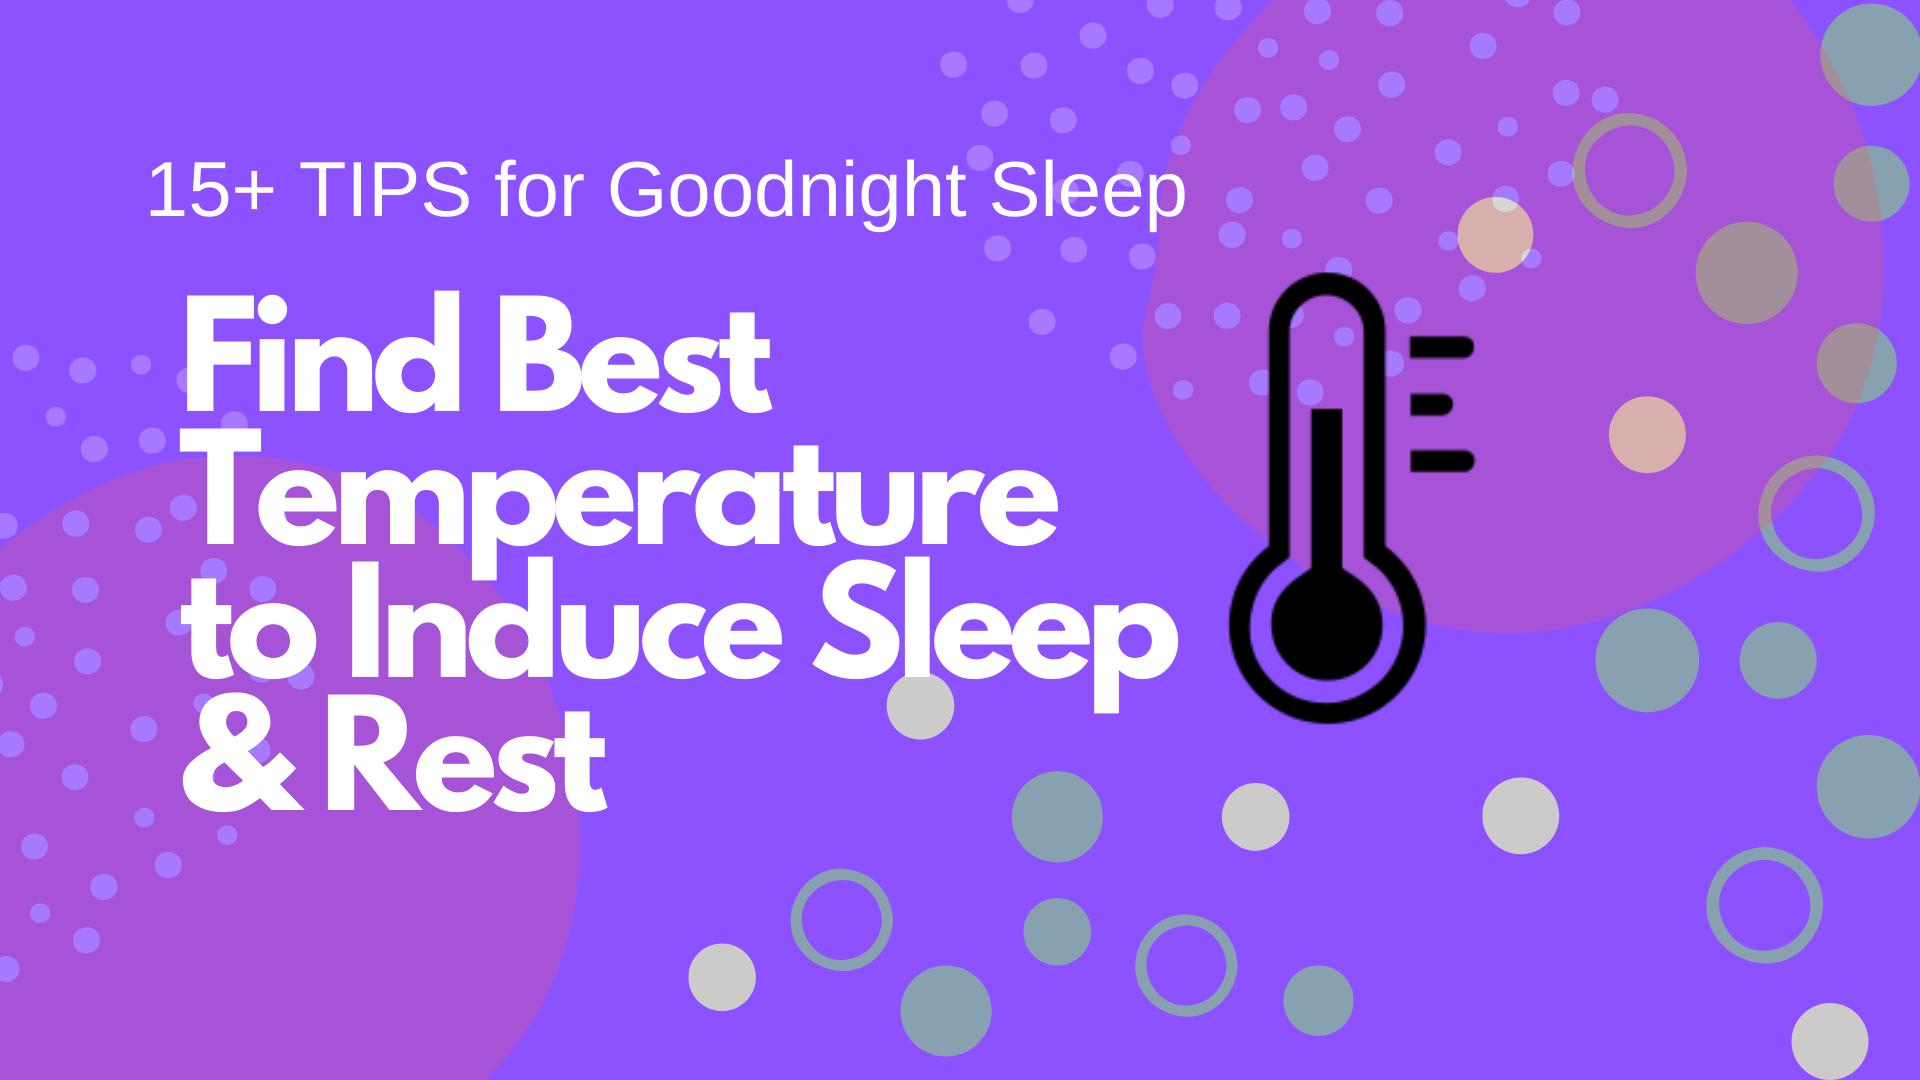 Find Best Temperature to Induce Rest